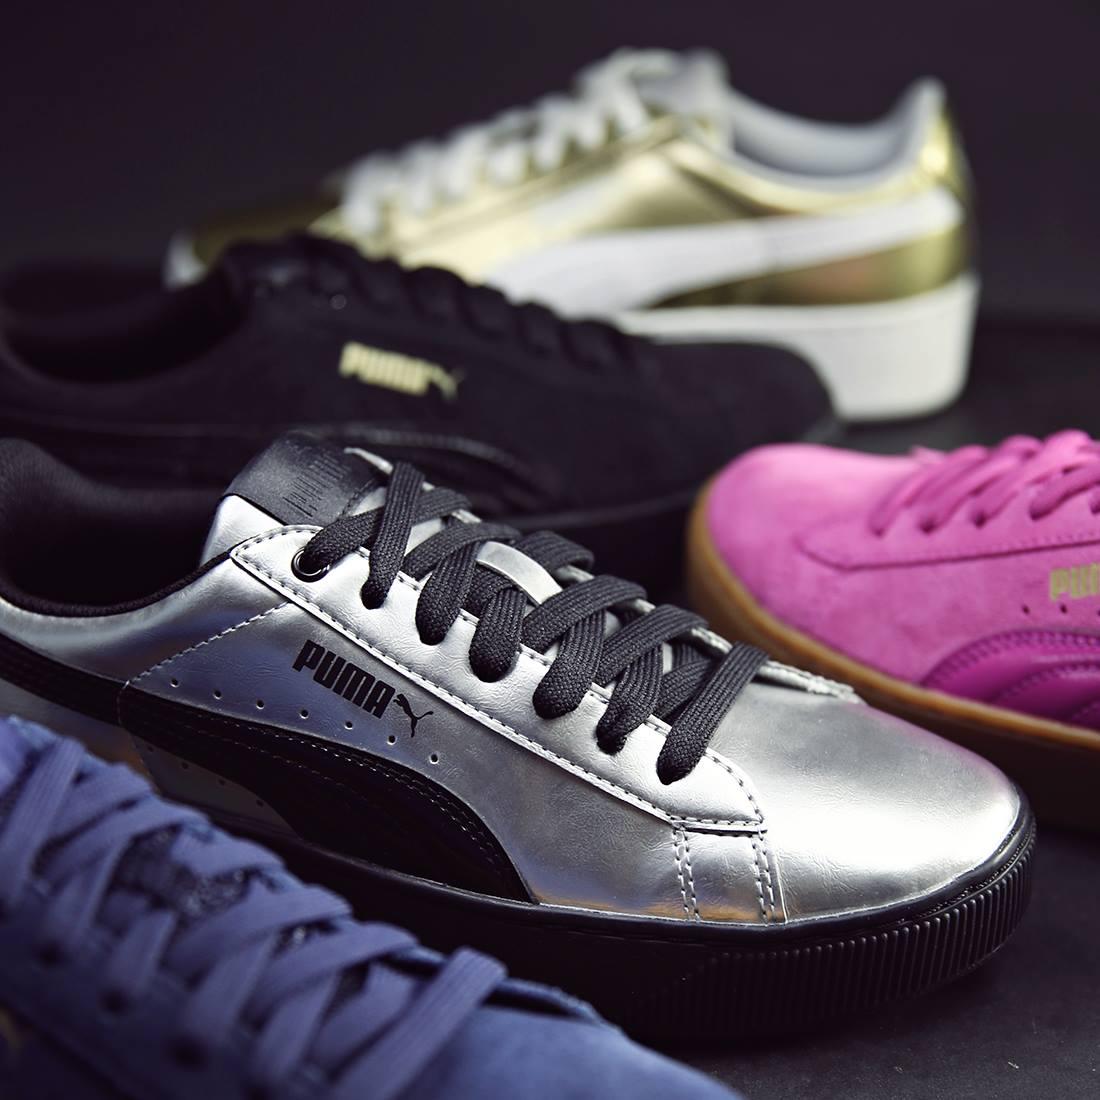 K obuvi PUMA naše zákaznice také rády objednávají  Crep Protect  nano-impregnační spray c738996f2a